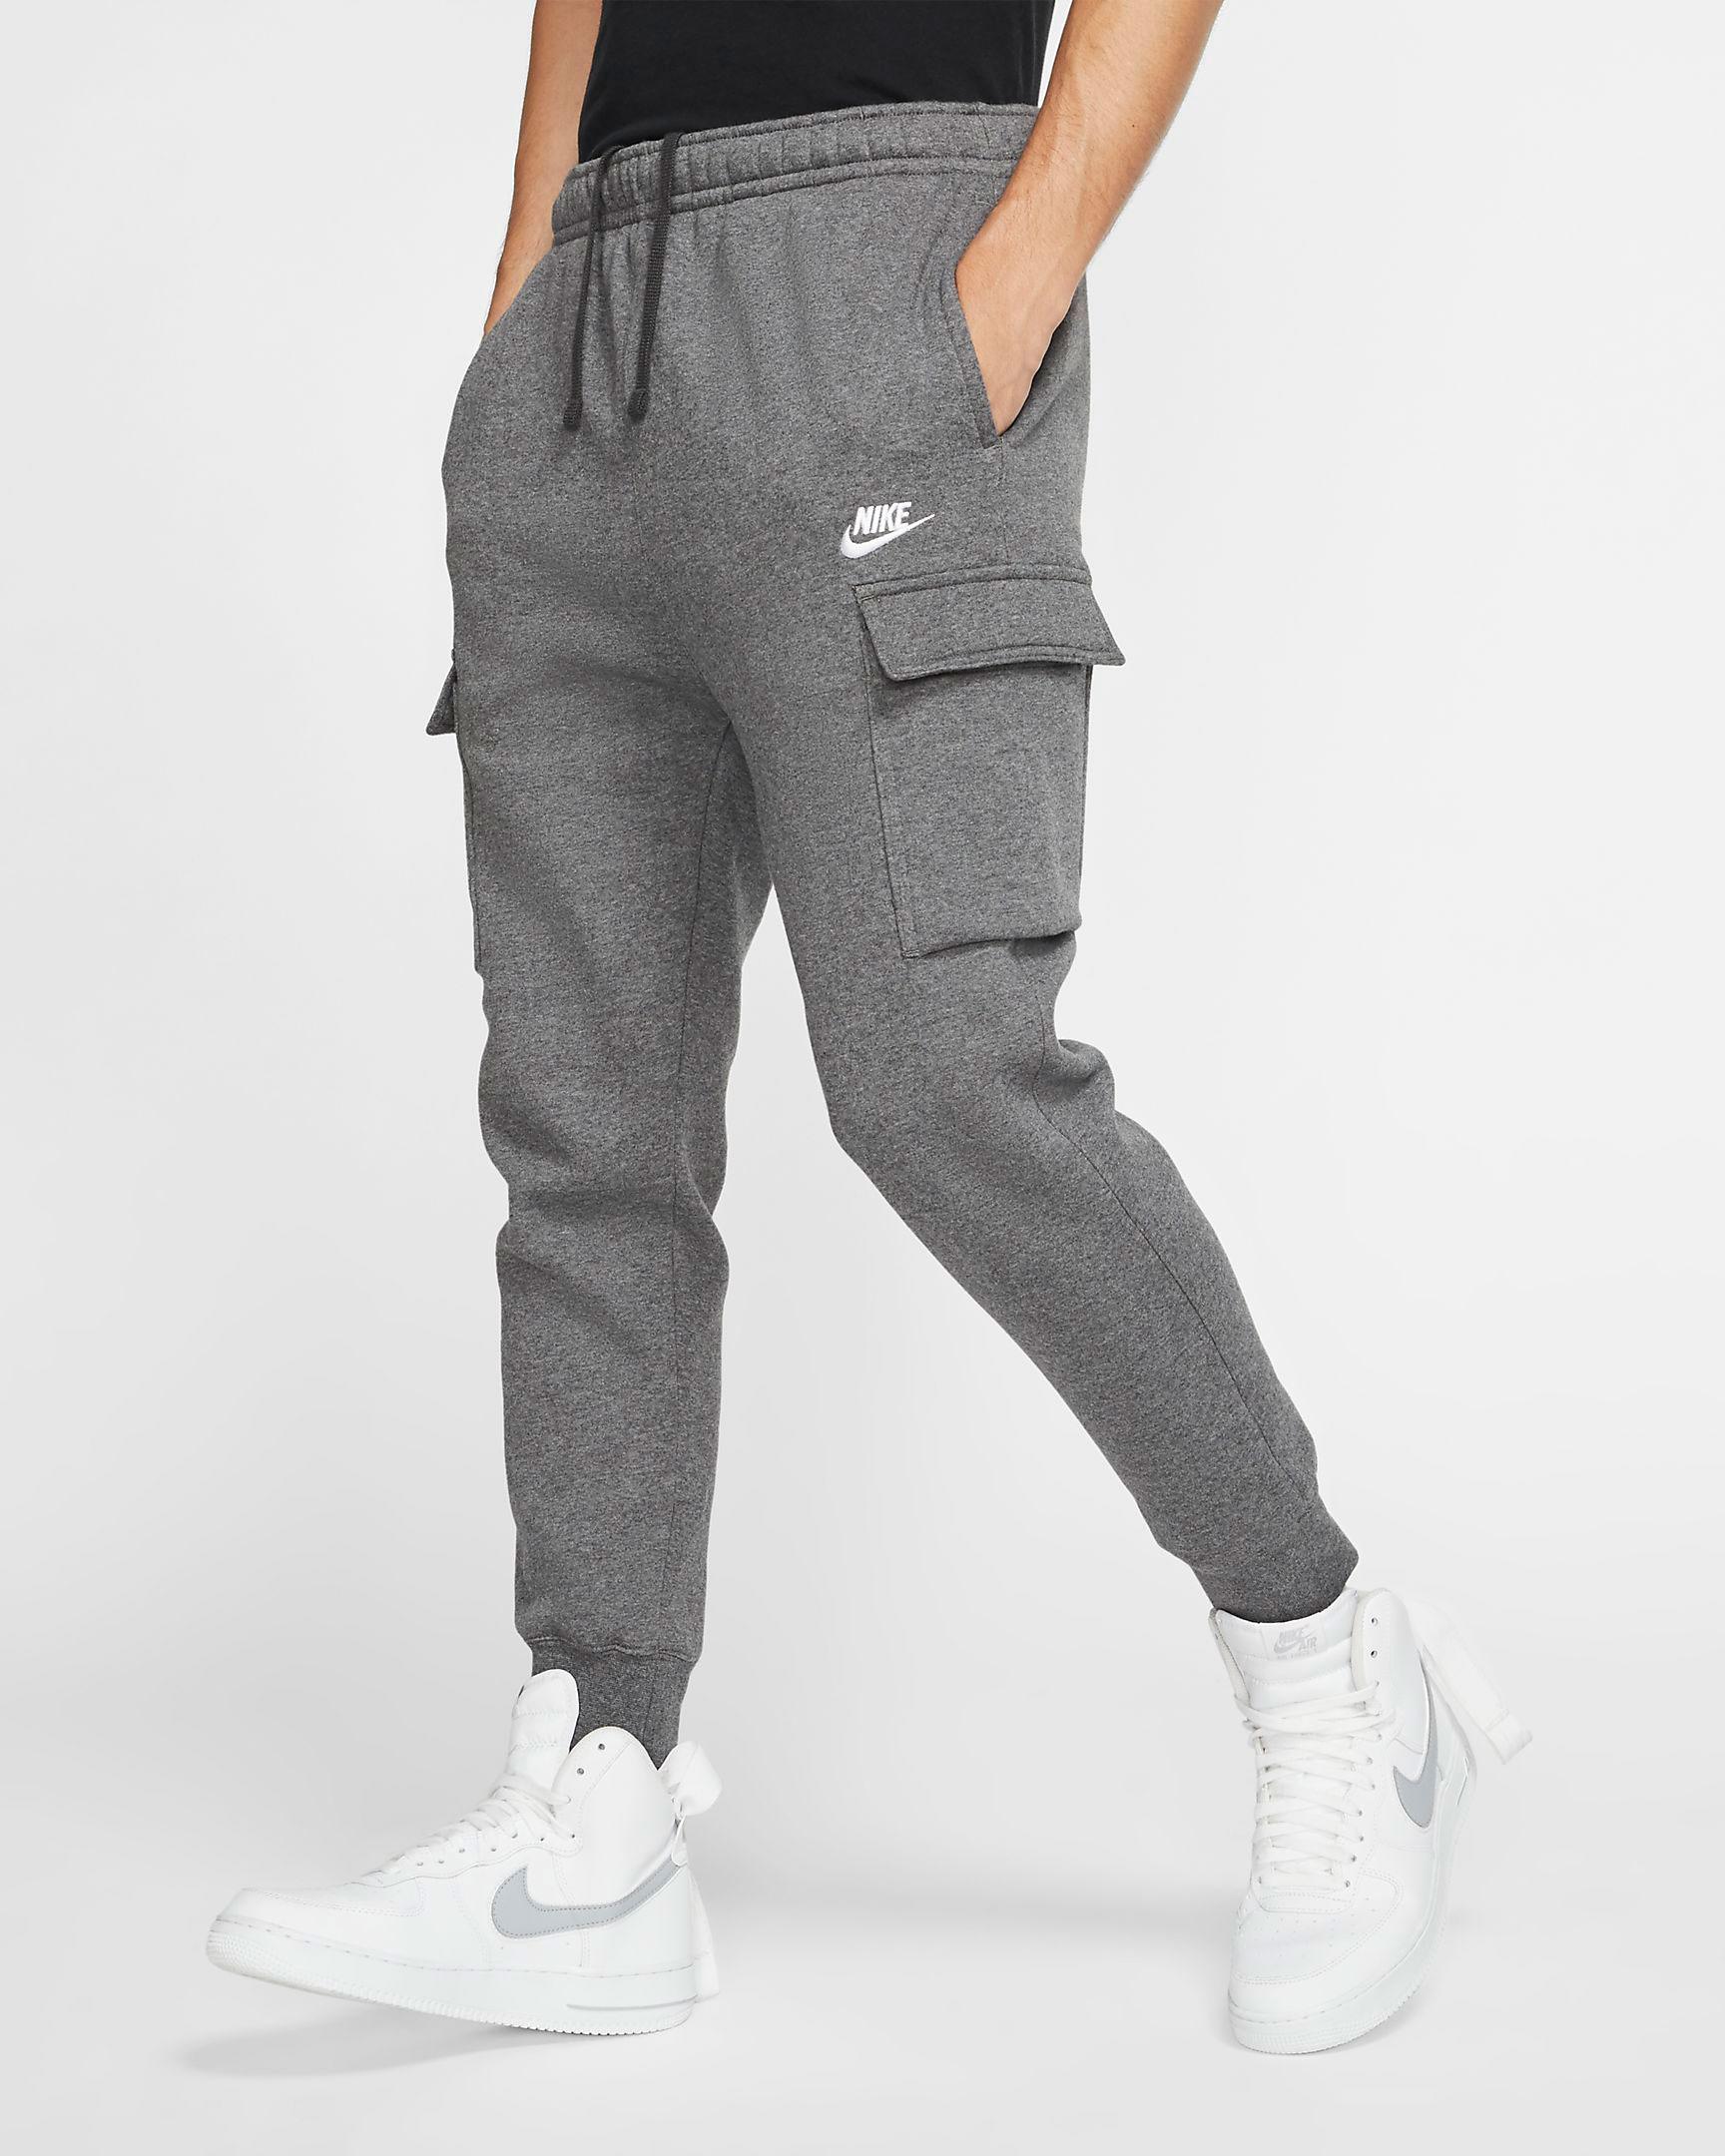 nike-sb-dunk-low-elephant-pants-match-2